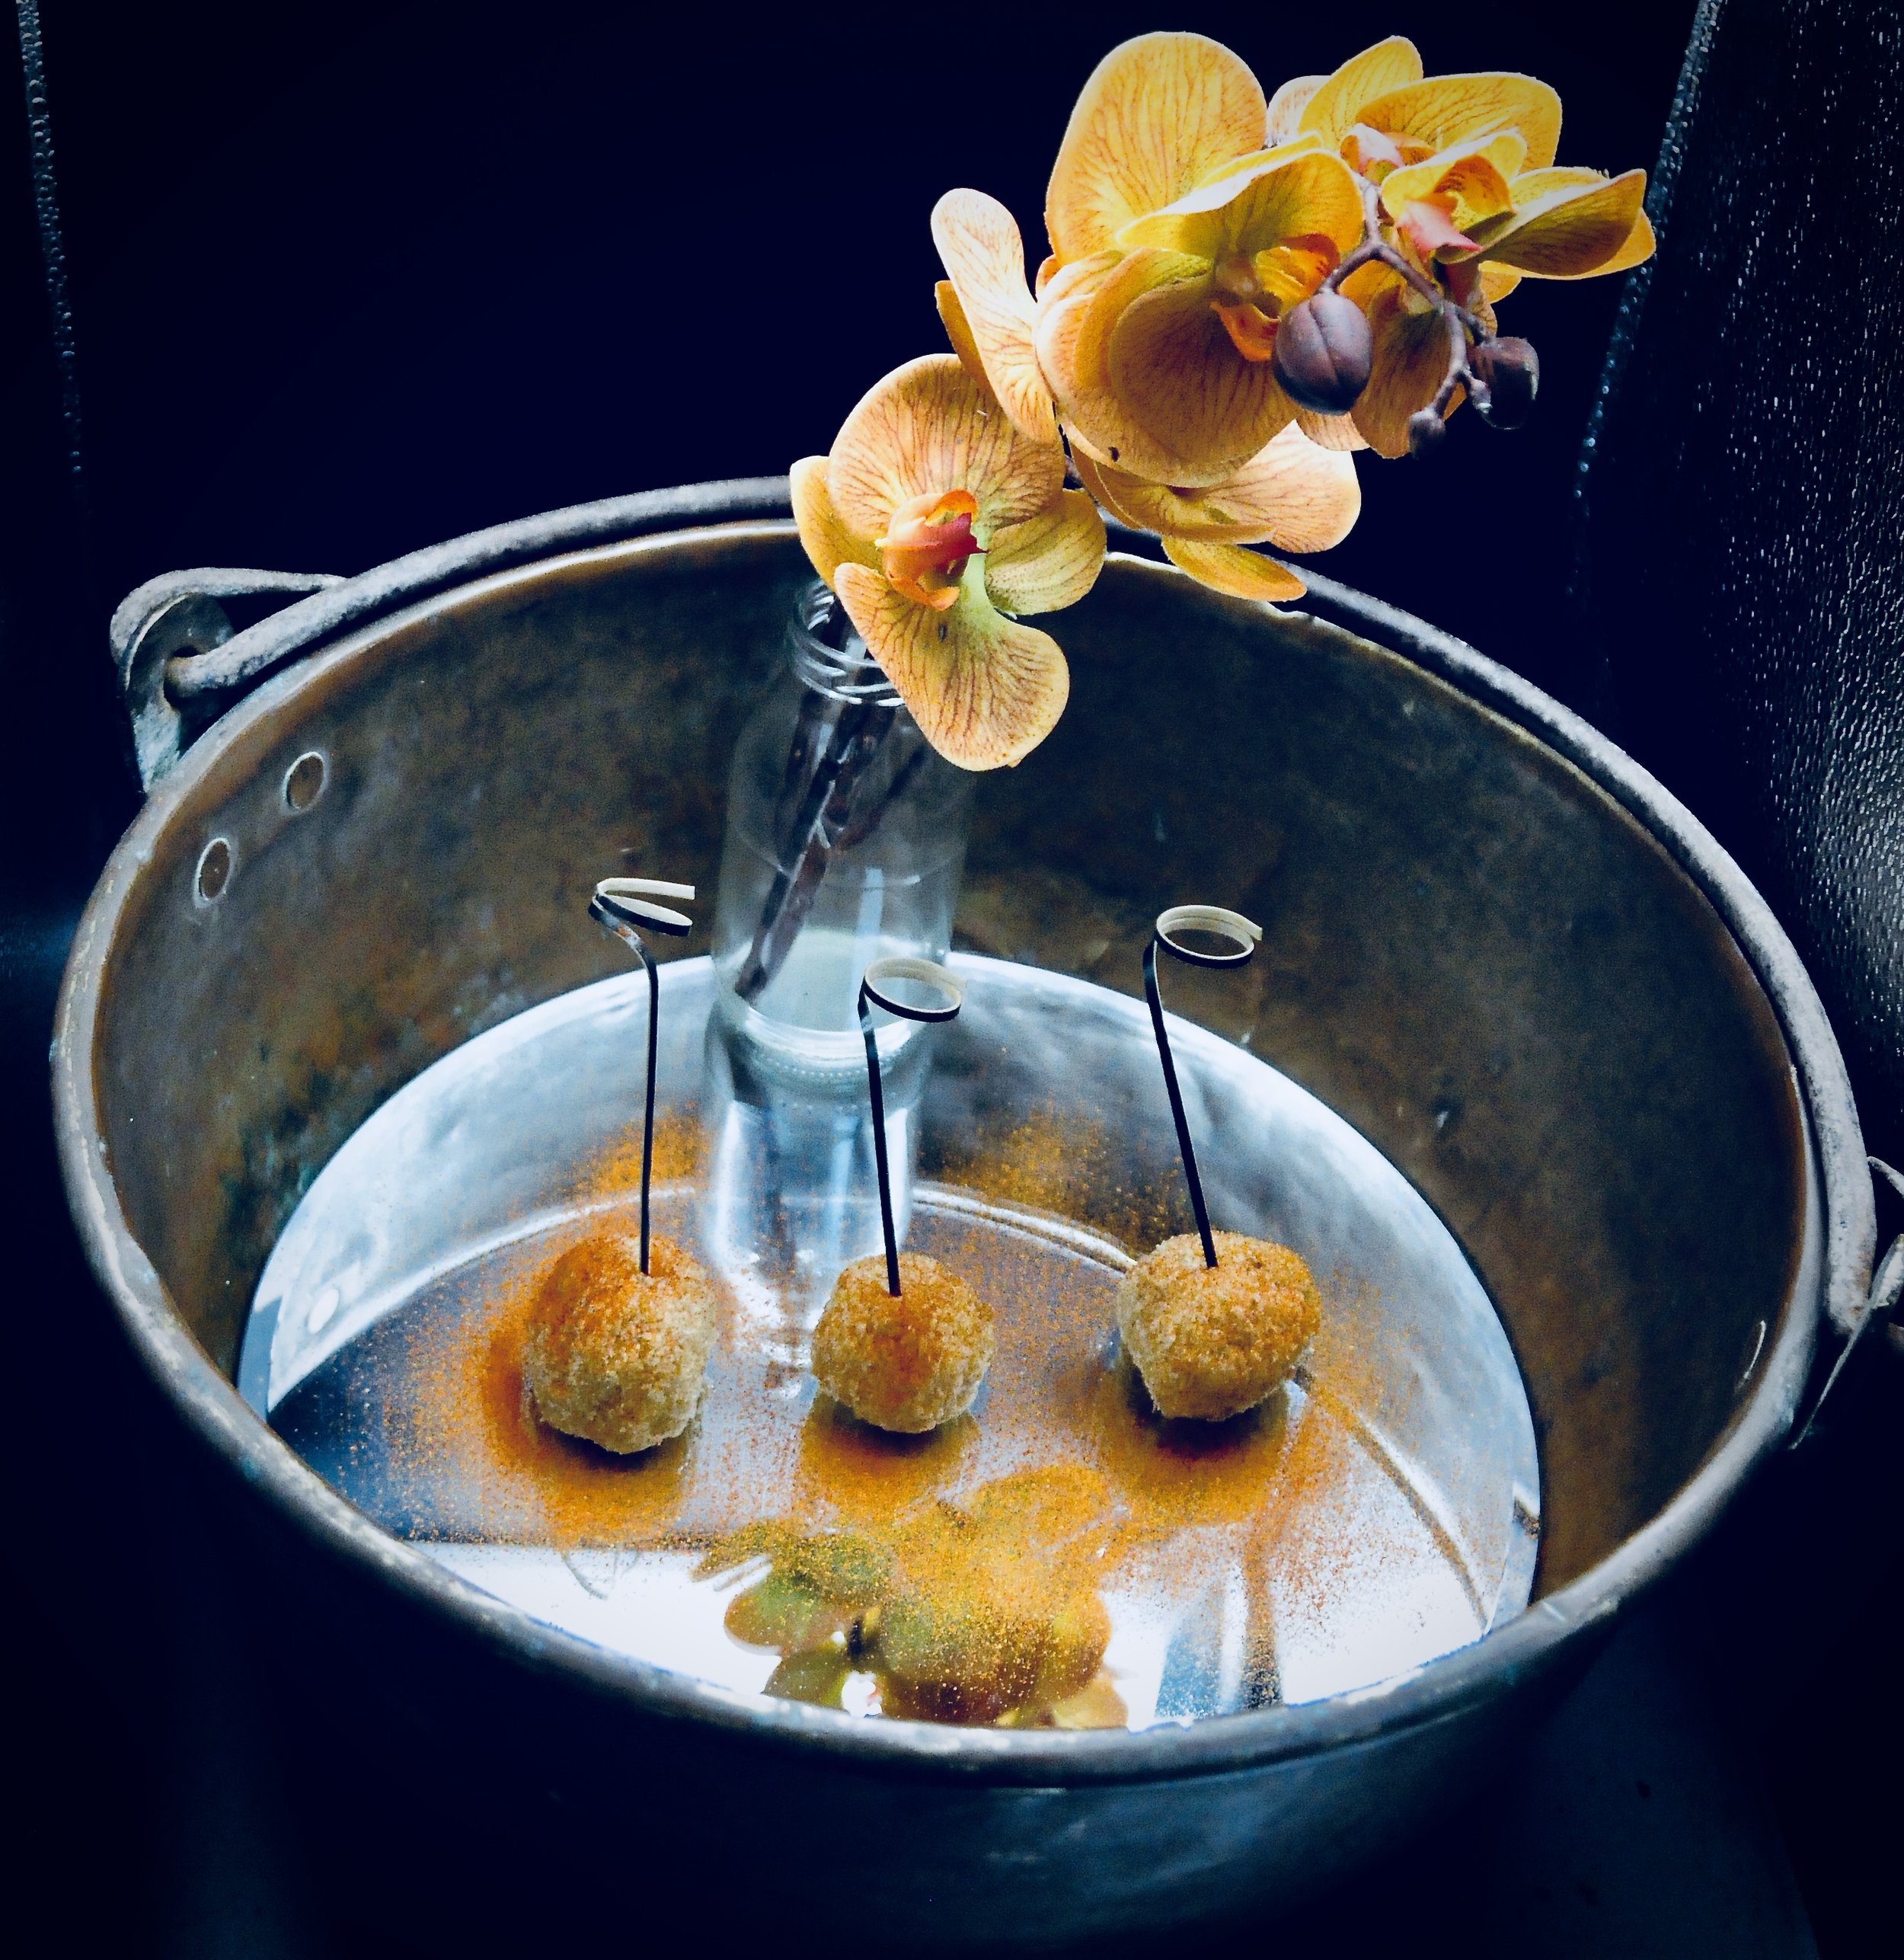 Butternut squash, thyme, chestnut and mozzarella arancini balls